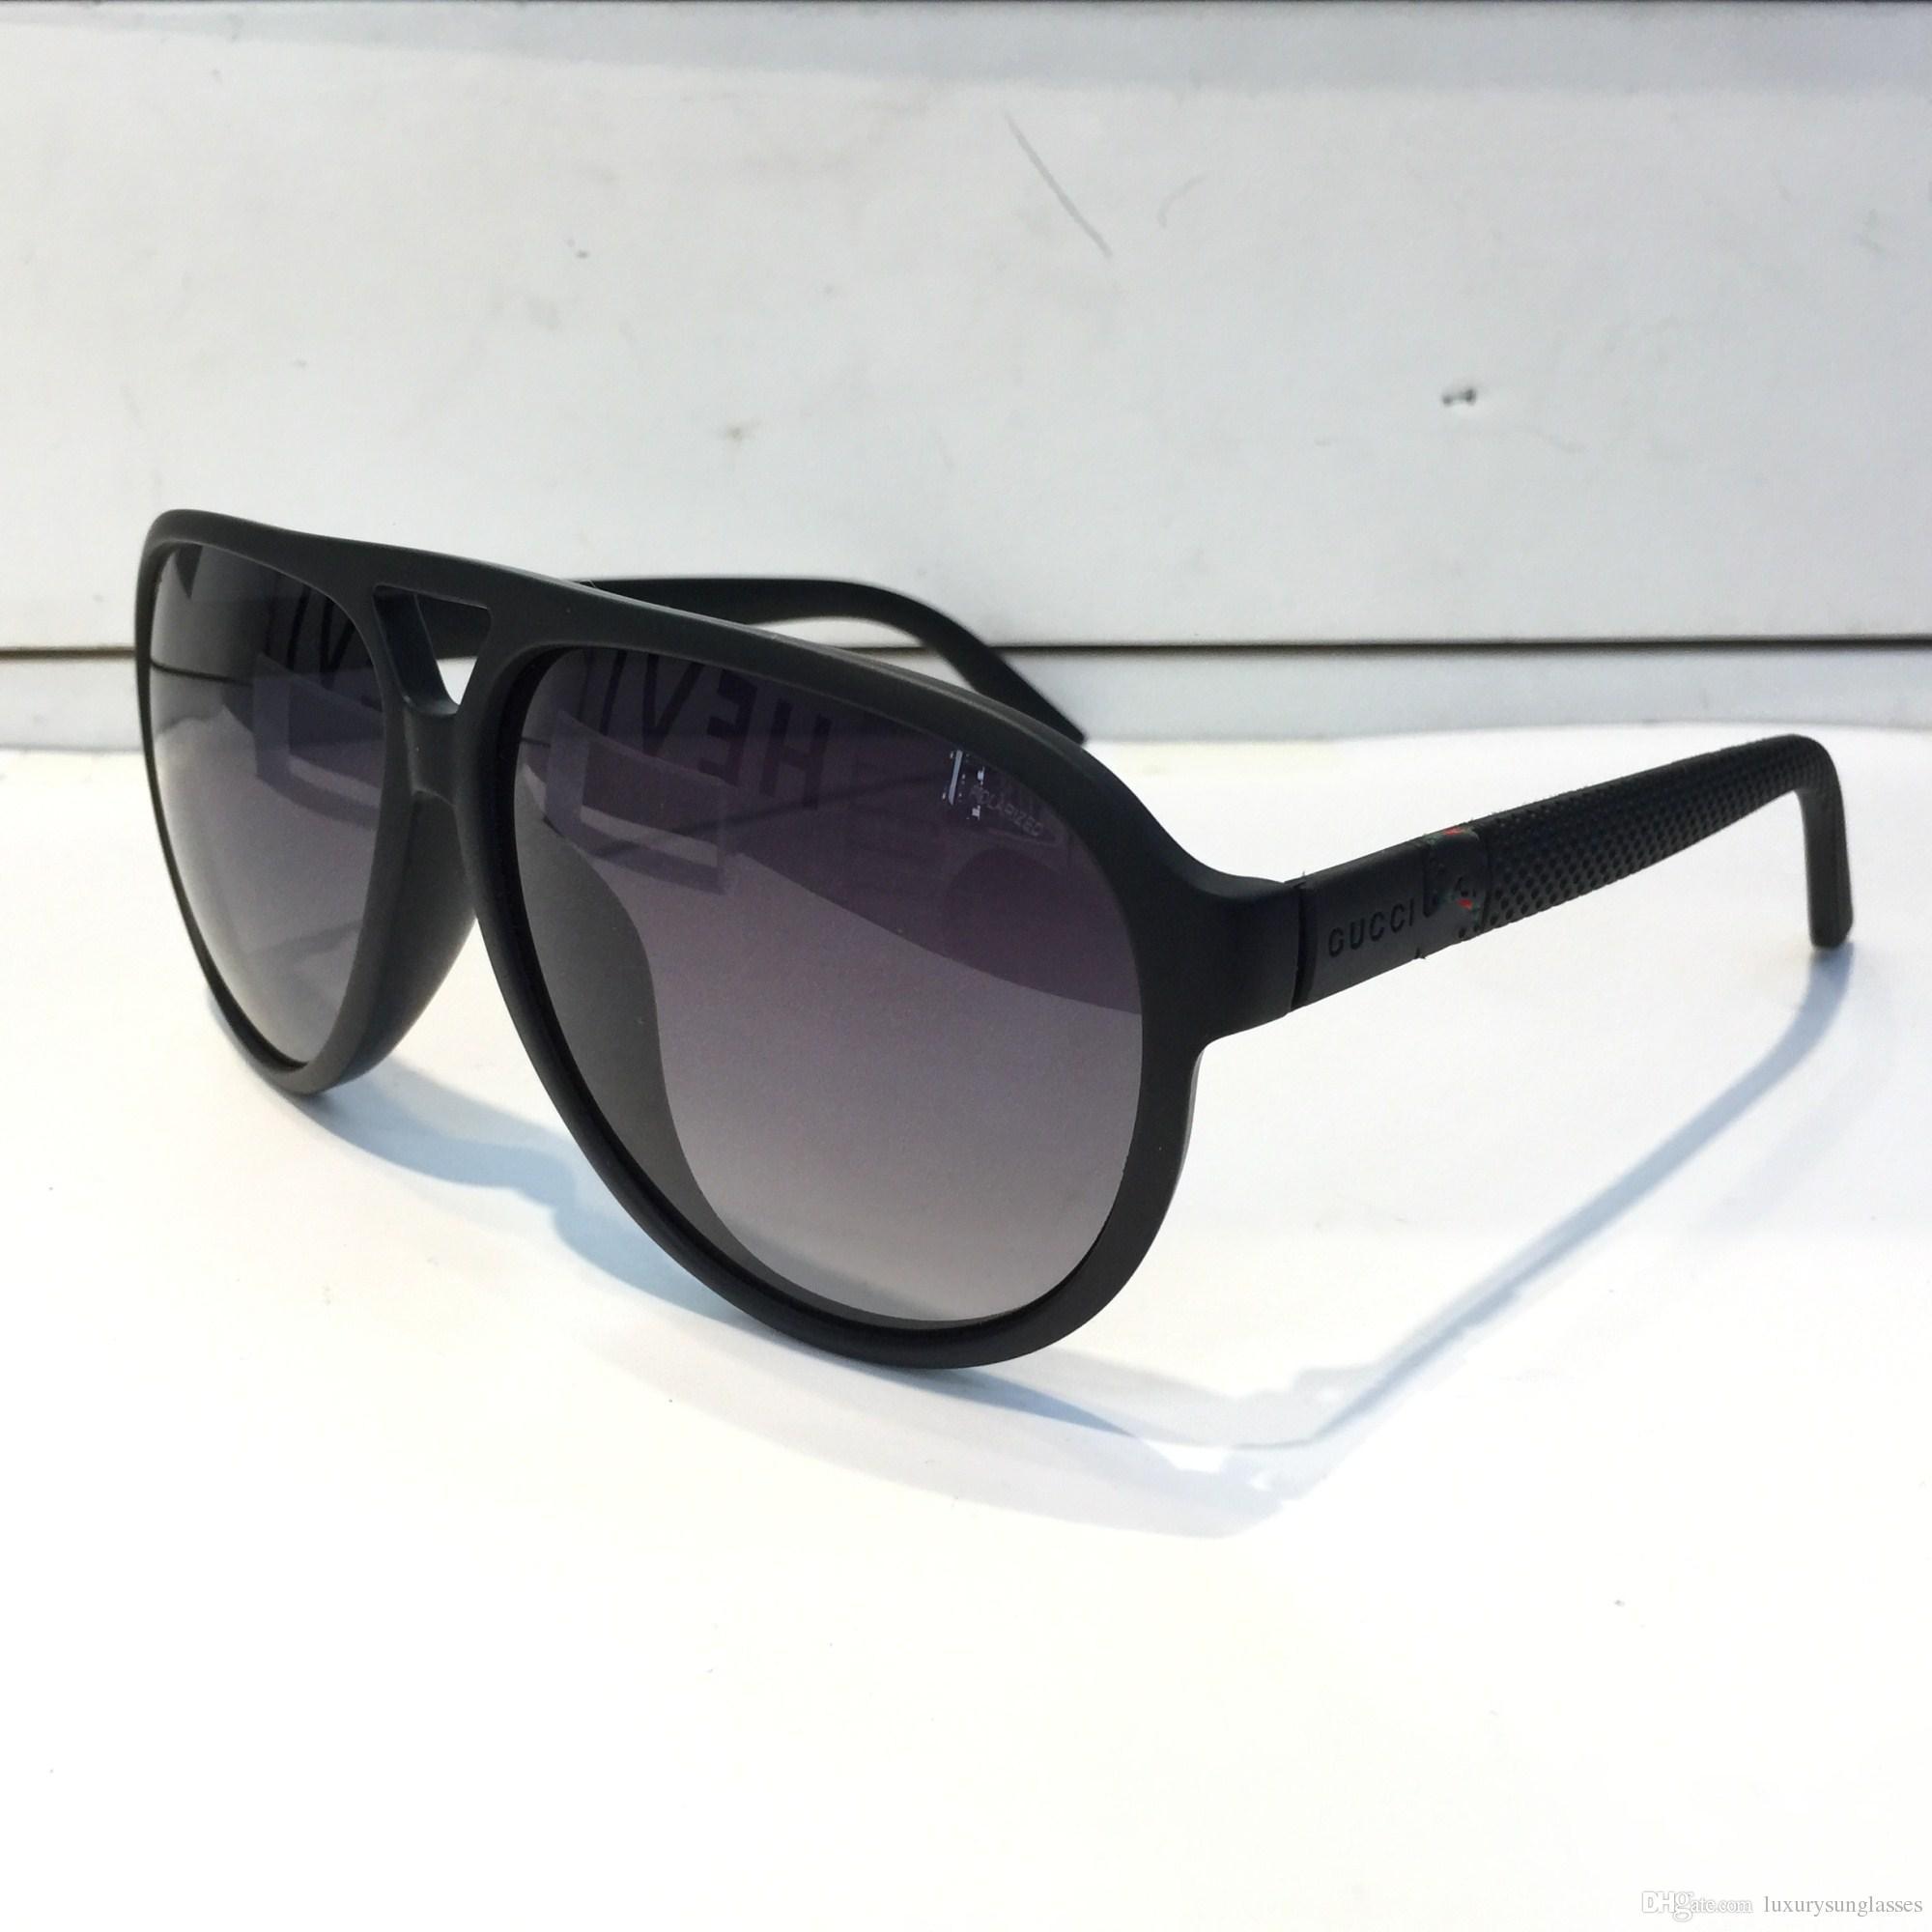 Luxury 1065 Sunglasses For Men Design Fashion Sunglasses Wrap ...